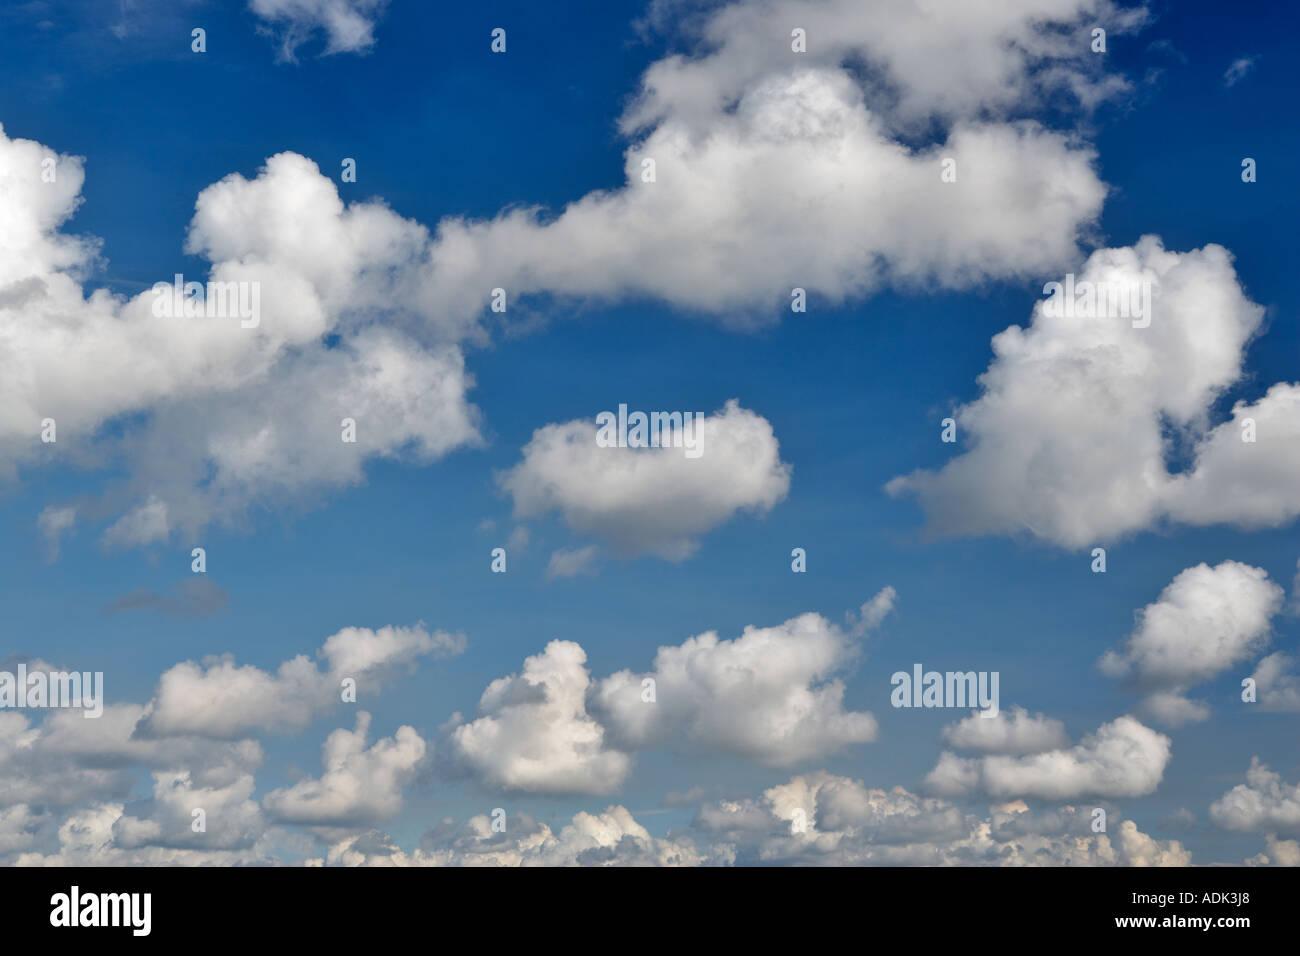 Cumulous clouds over Sokol Blossor Vineyards Oregon - Stock Image